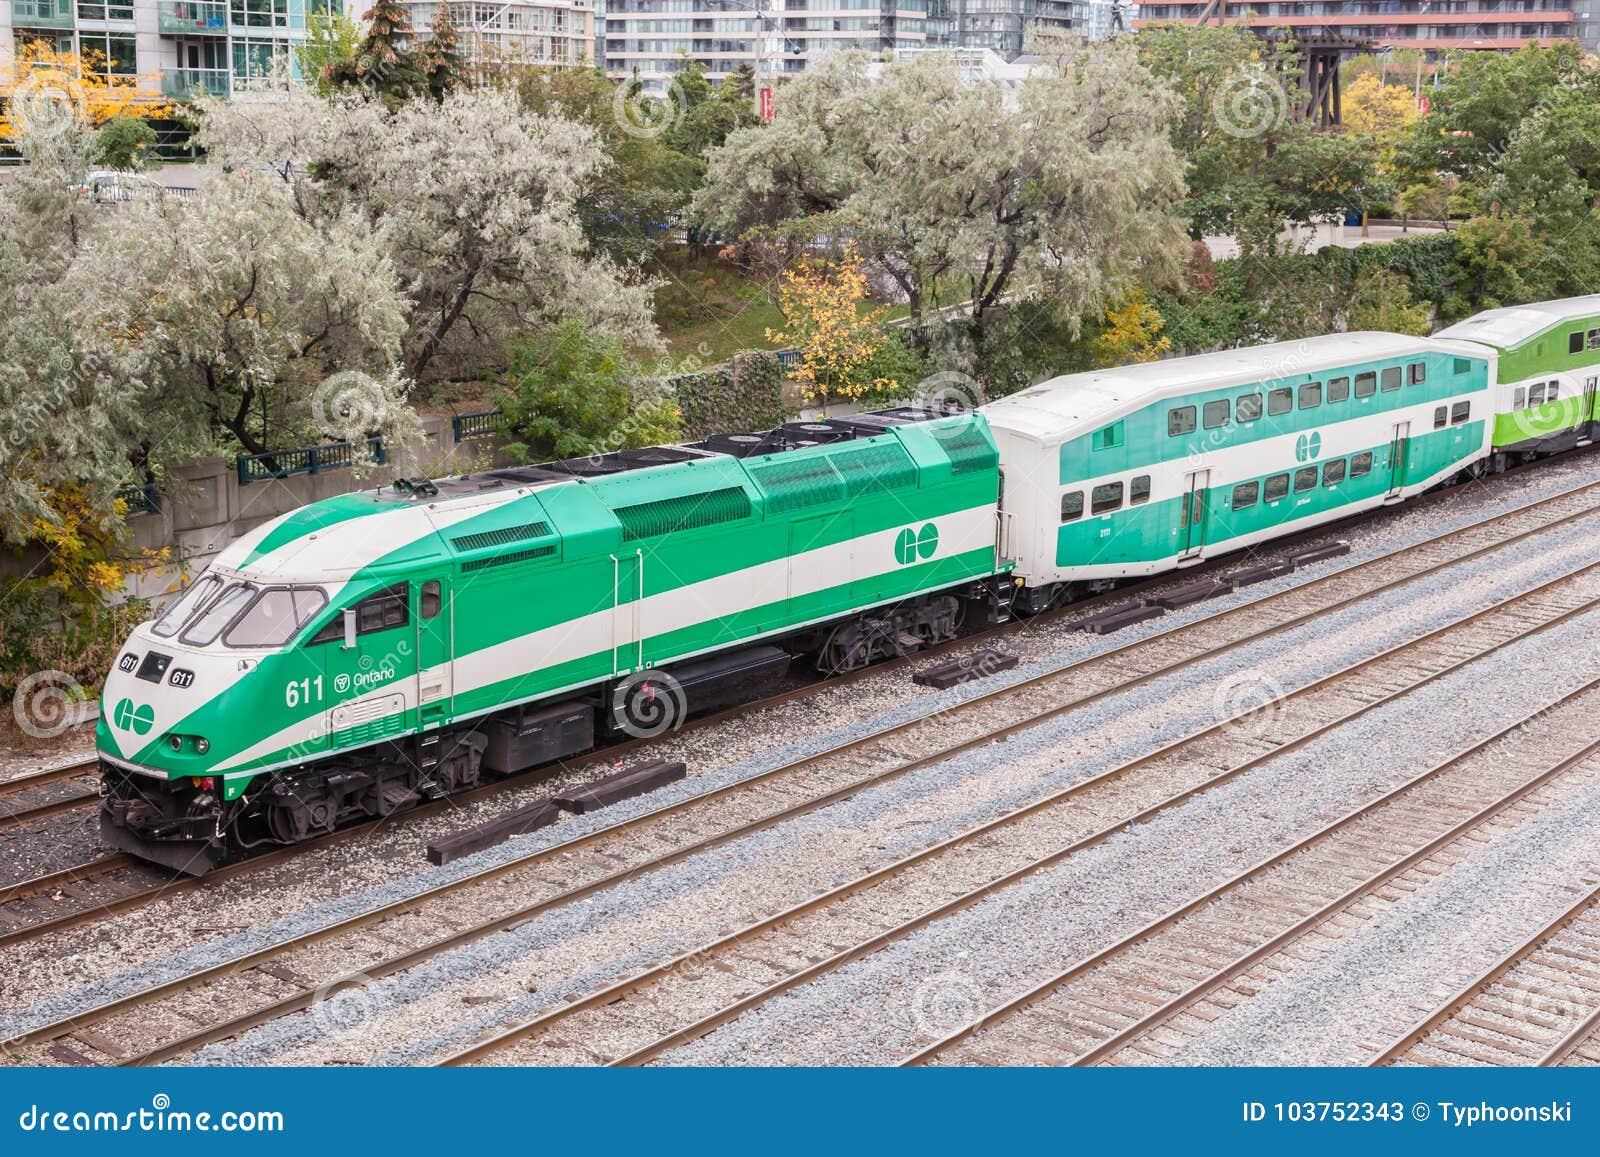 Go Transit train in Toronto, Canada